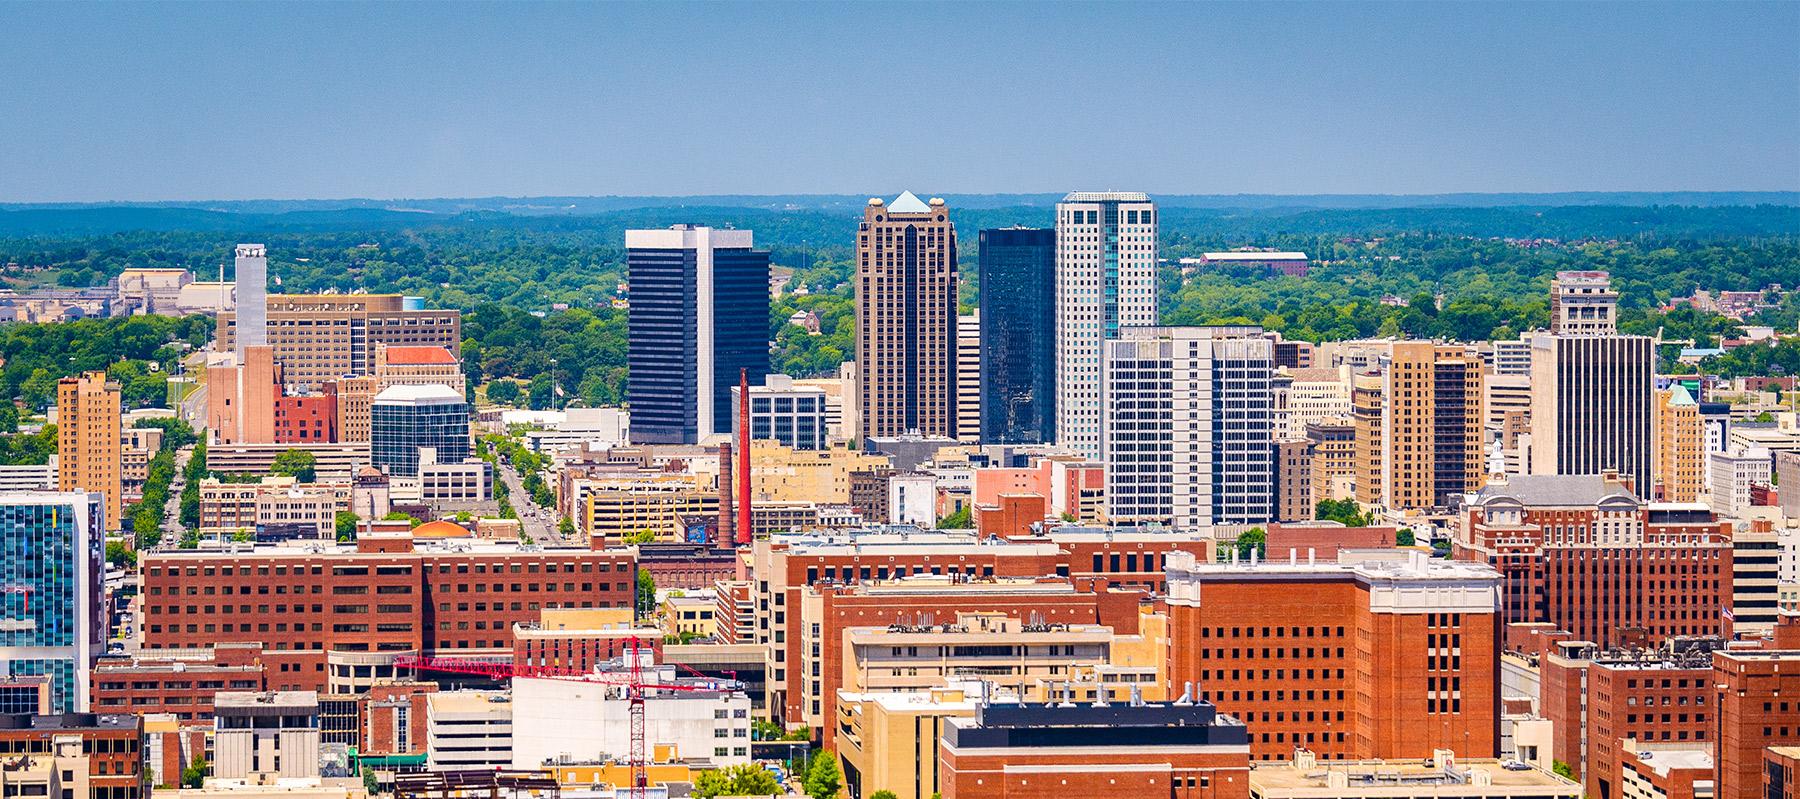 Image of Birmingham, AL